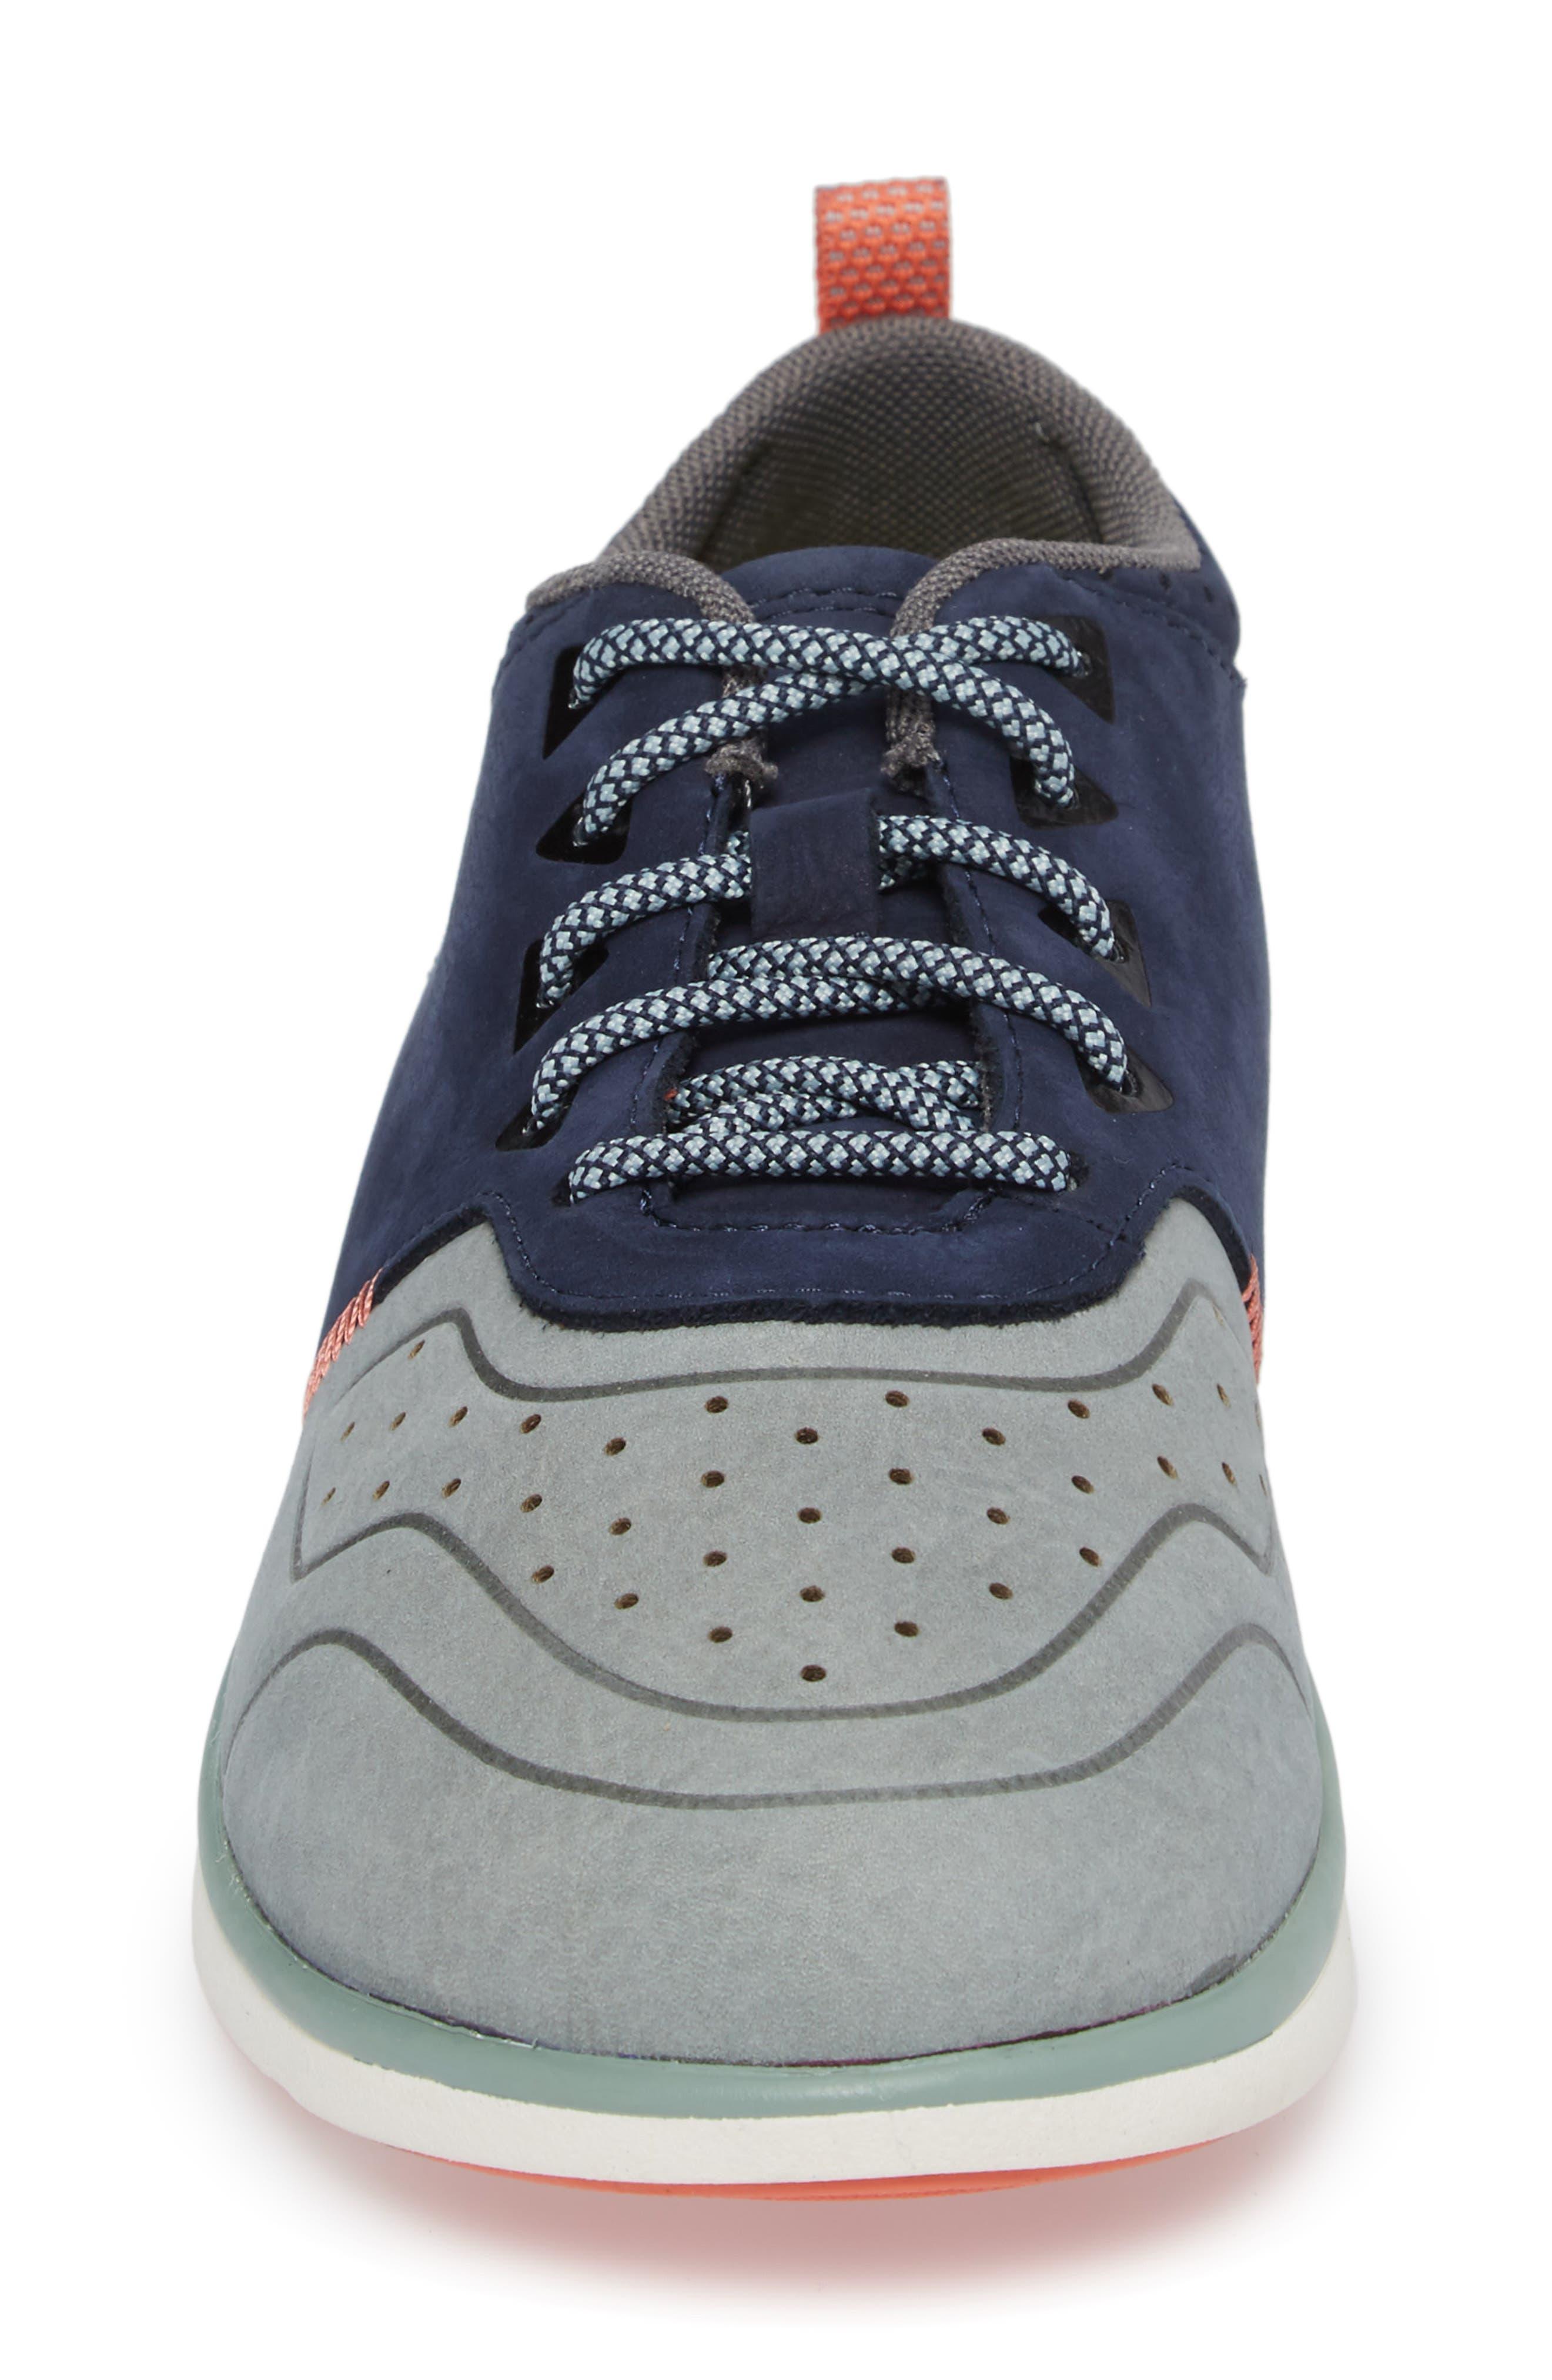 Beech Sneaker,                             Alternate thumbnail 4, color,                             Blue Leather